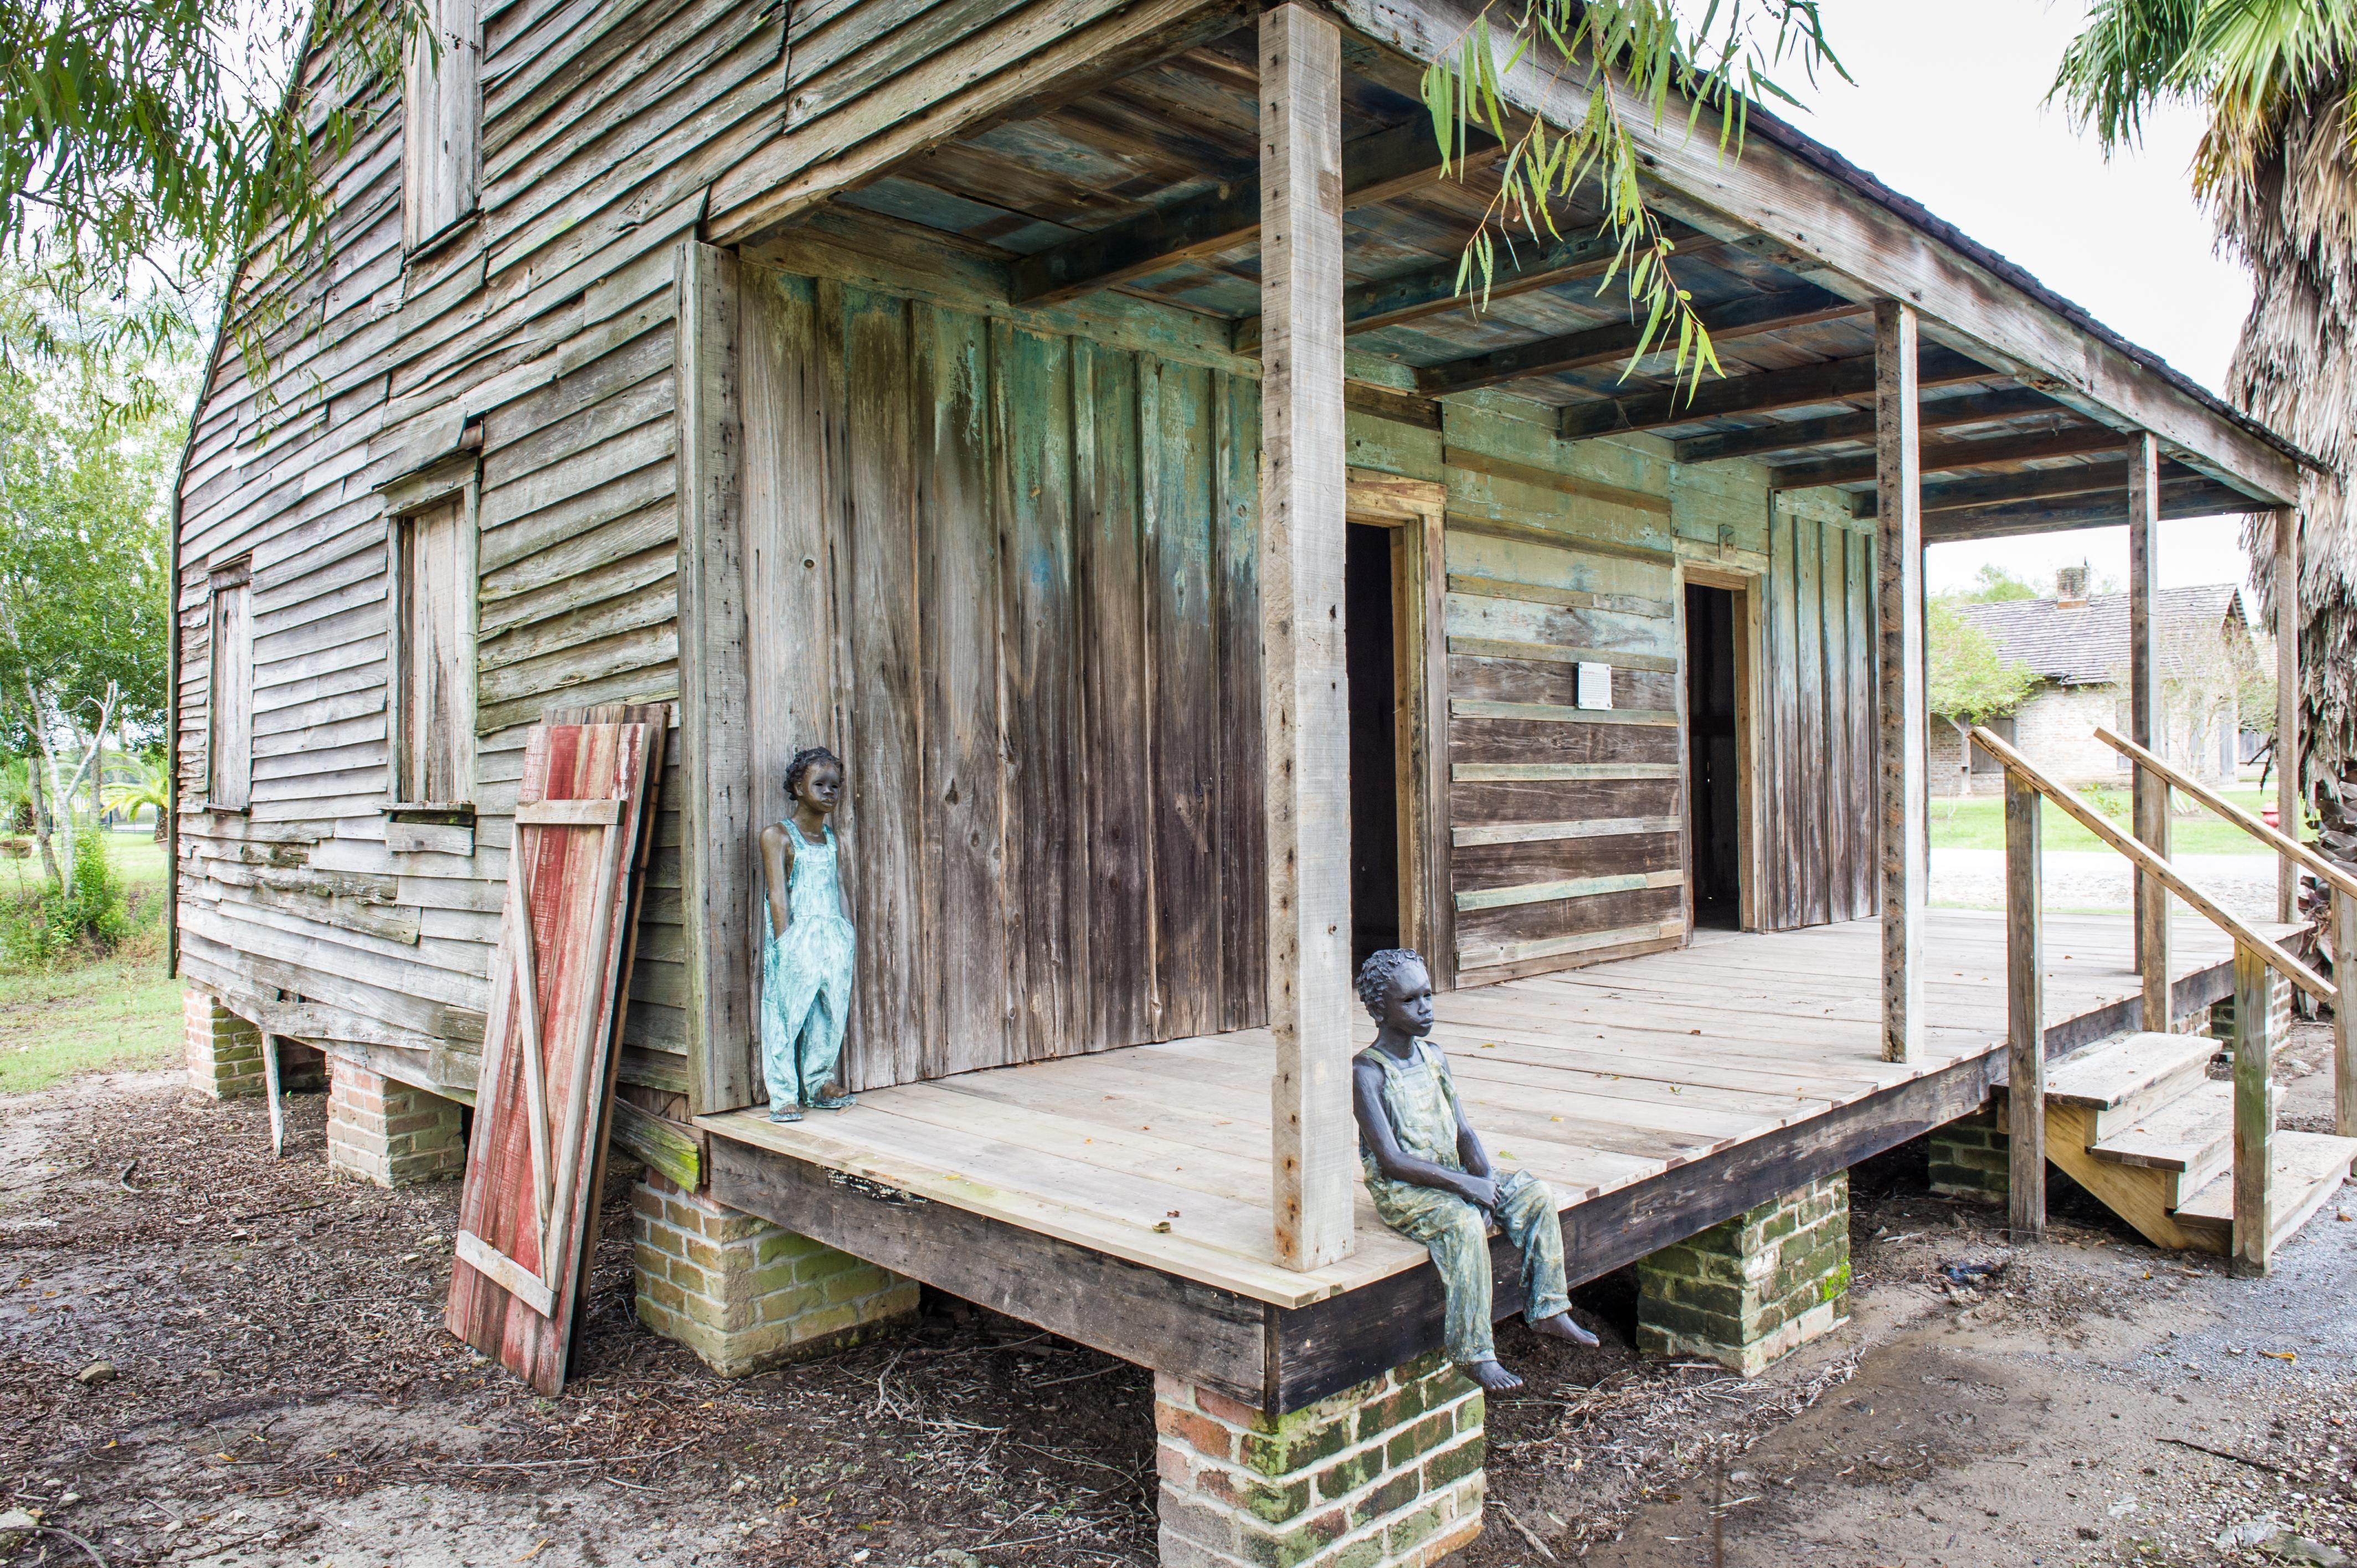 Whitney plantation museum - America's Auschwitz